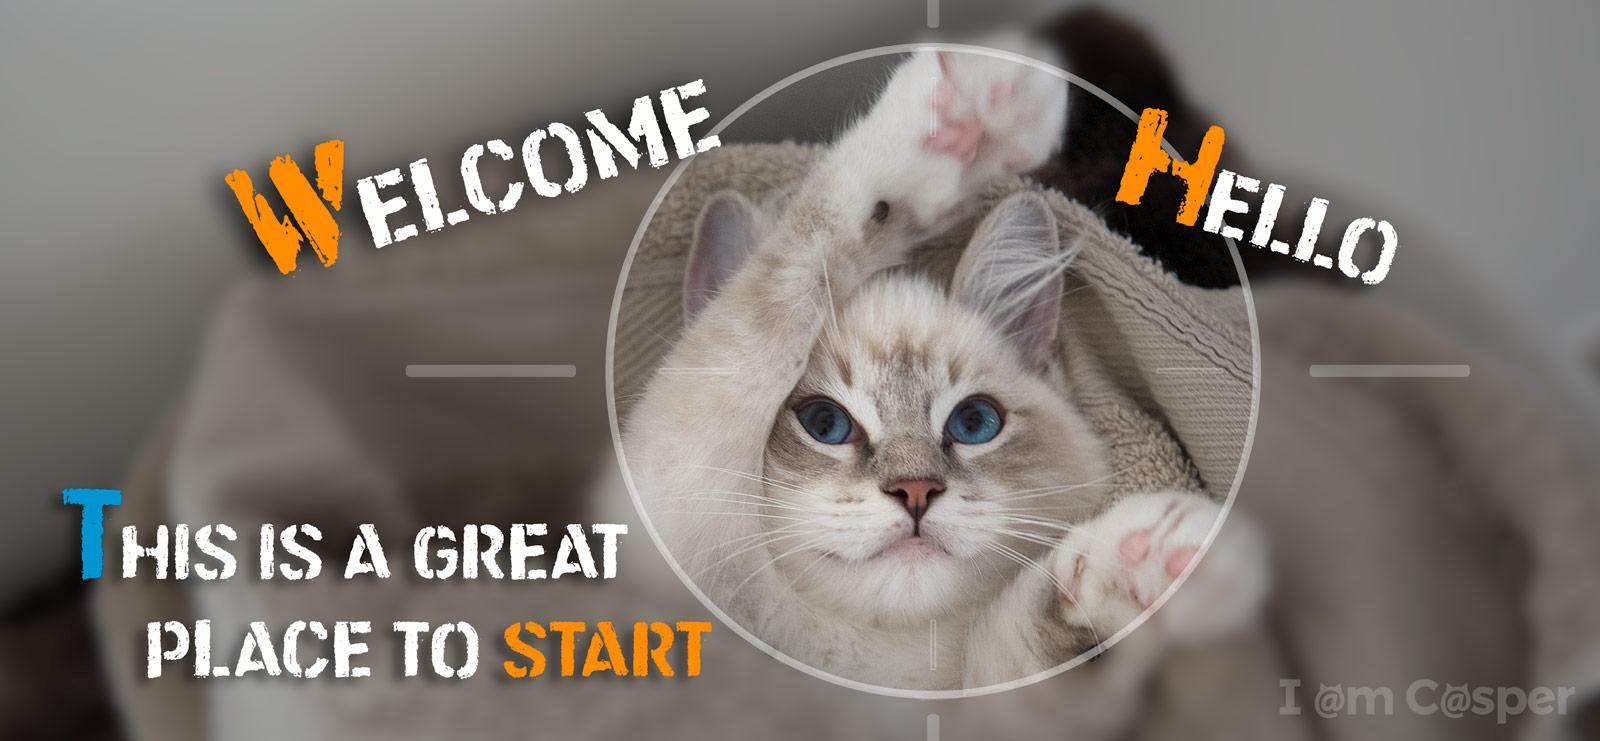 casper ragdoll kitten cat photography start here page waving hello